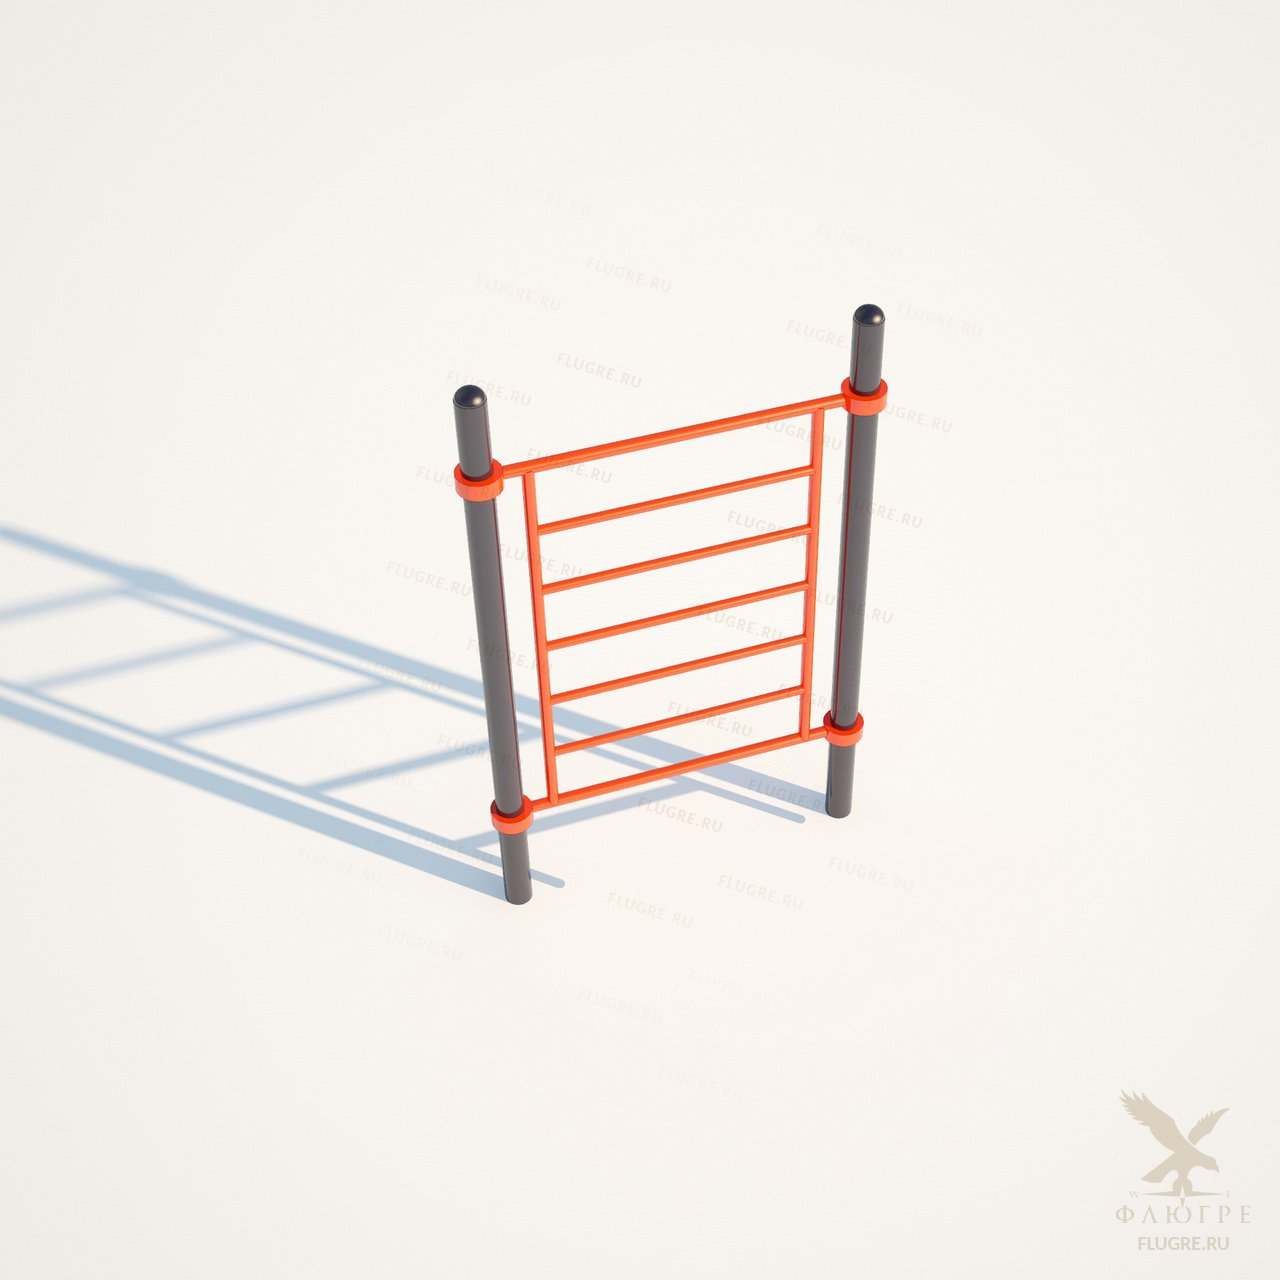 Шведская вертикальная лестница Workoutcity W-017